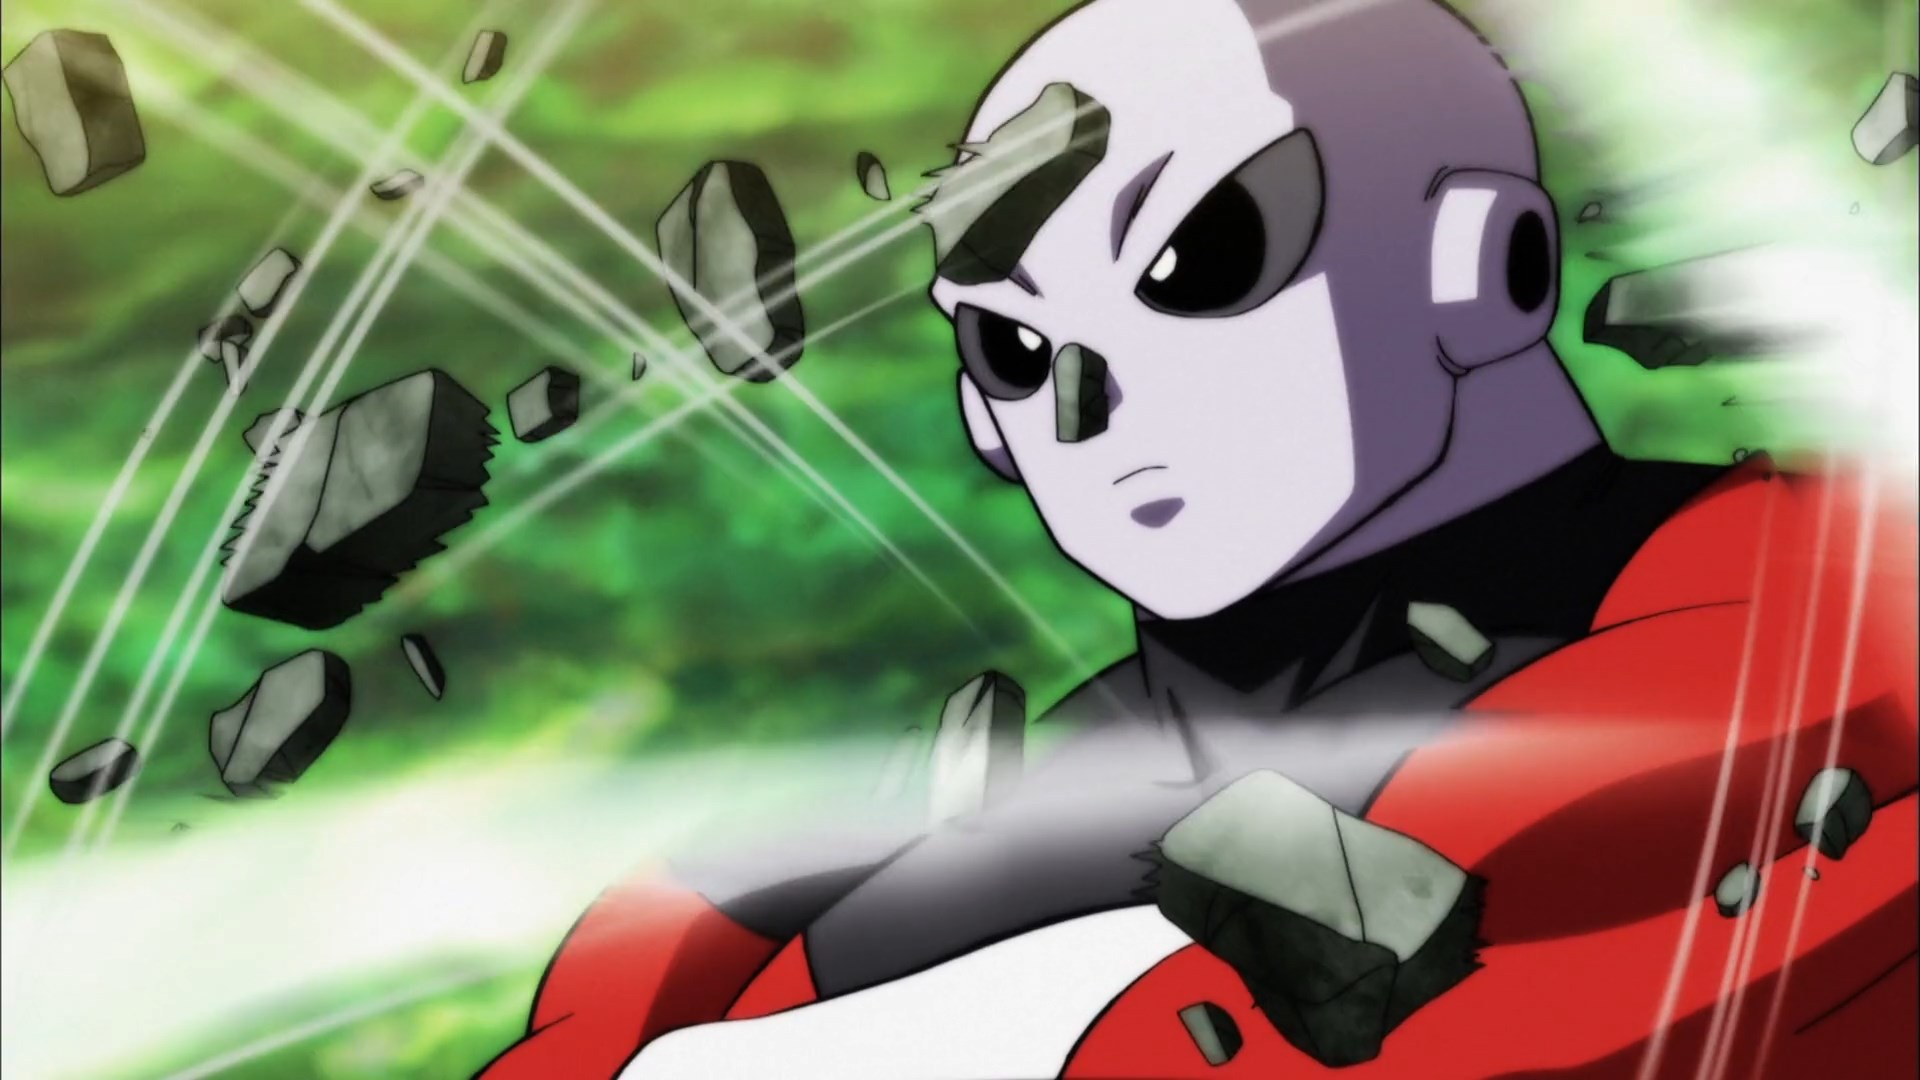 [HorribleSubs] Dragon Ball Super - 121 [1080p].mkv_snapshot_08.31